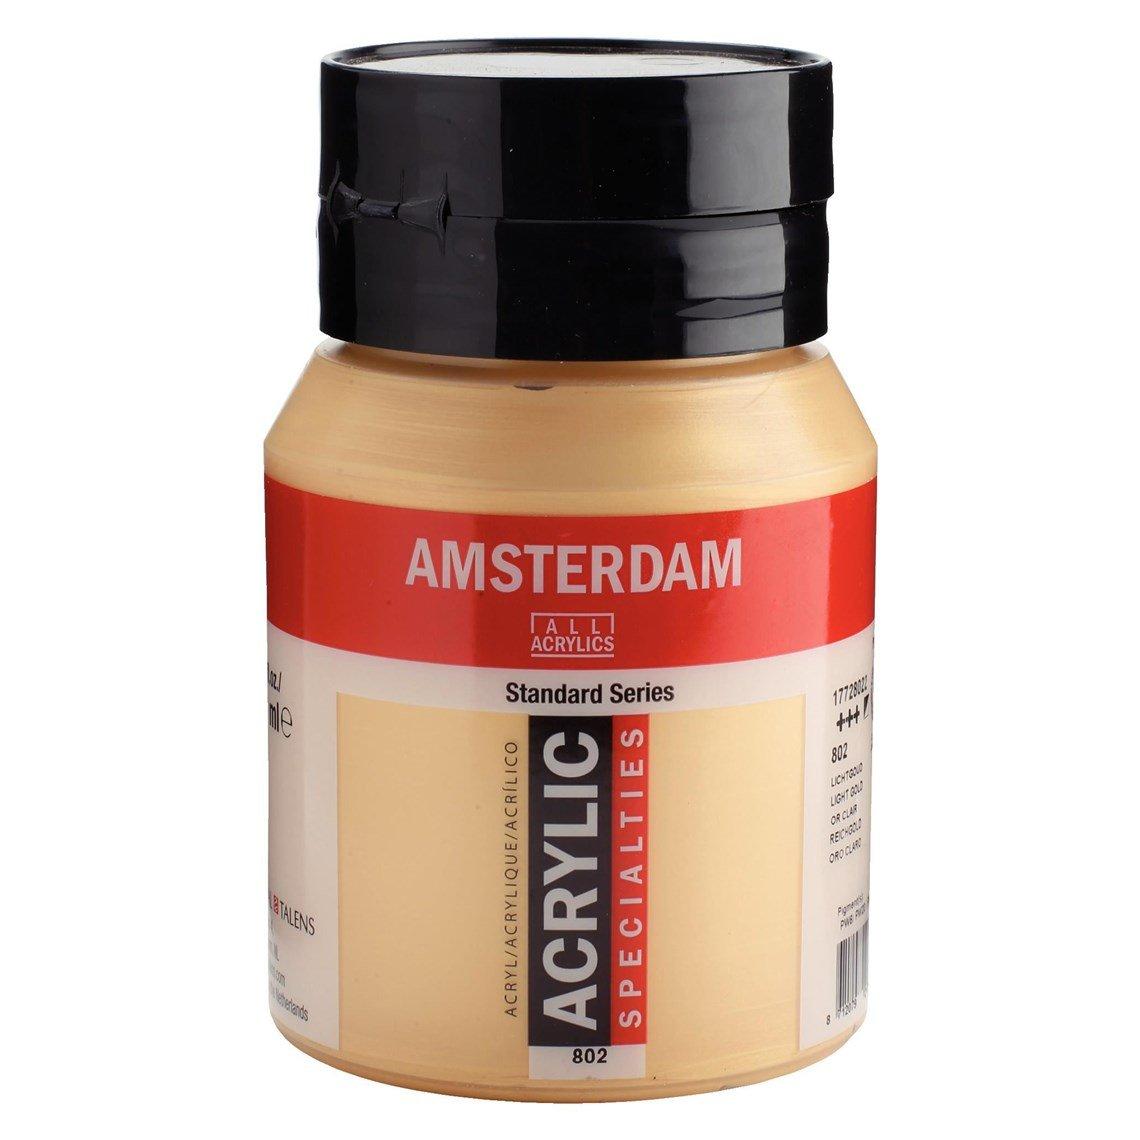 Amsterdam Acryl Lichtgoud 802 specialties